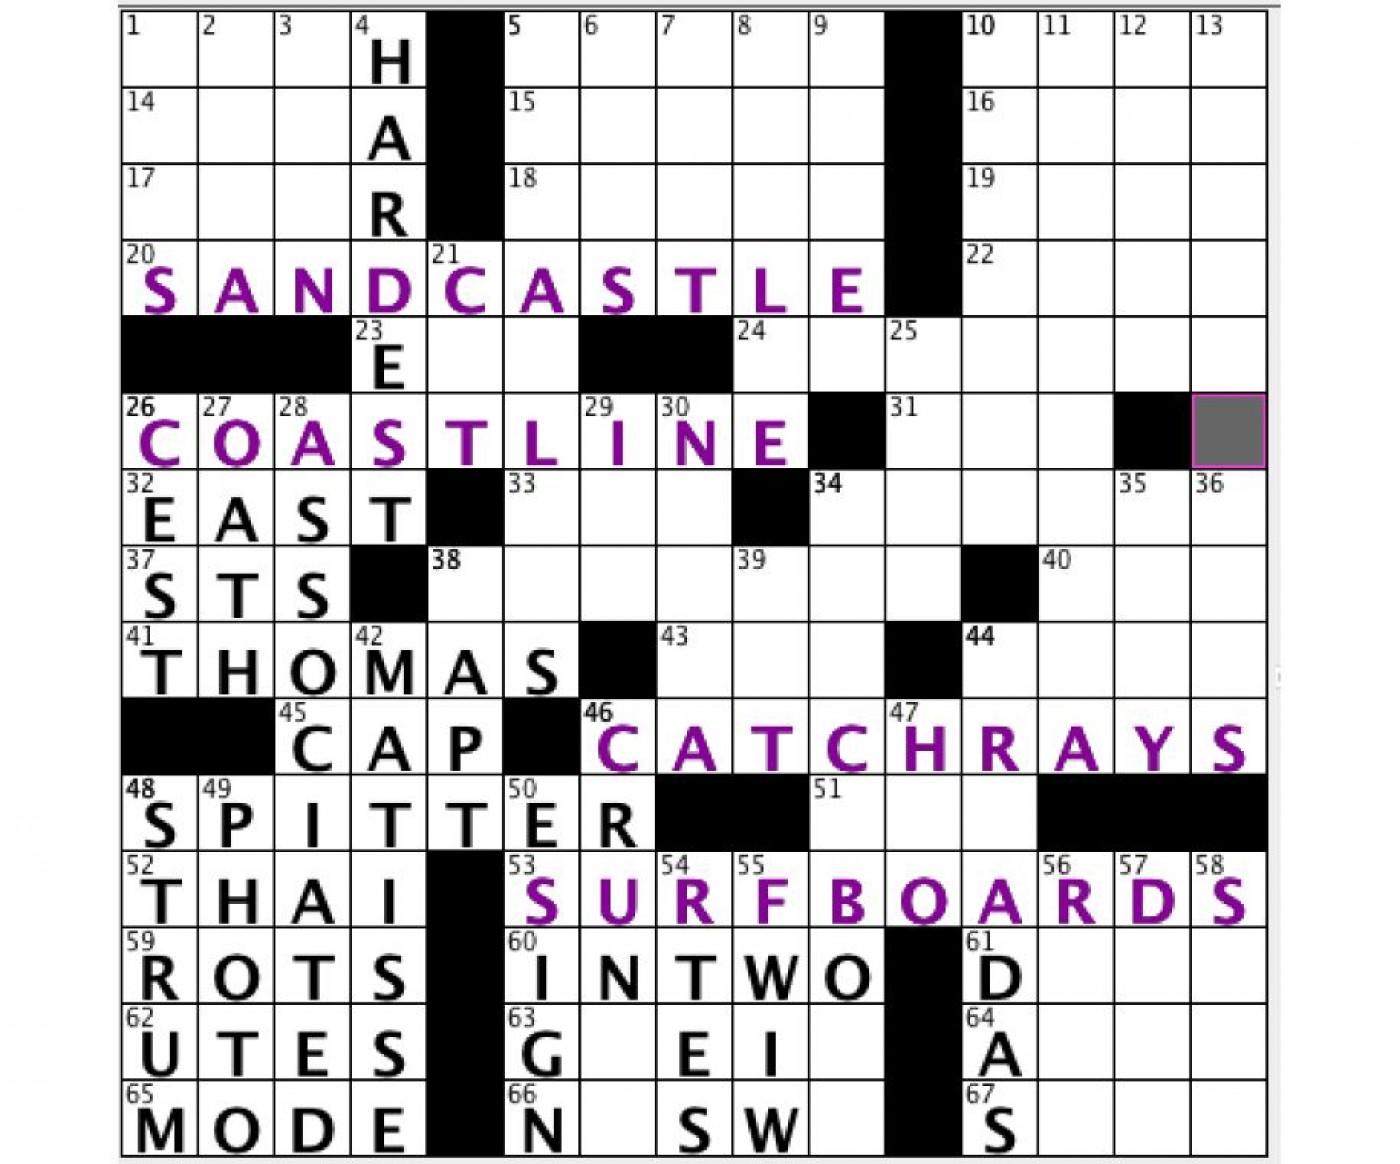 000 Unforgettable Robust Crossword Clue Sample  Strong 4 Letter Vigorou 7 81400